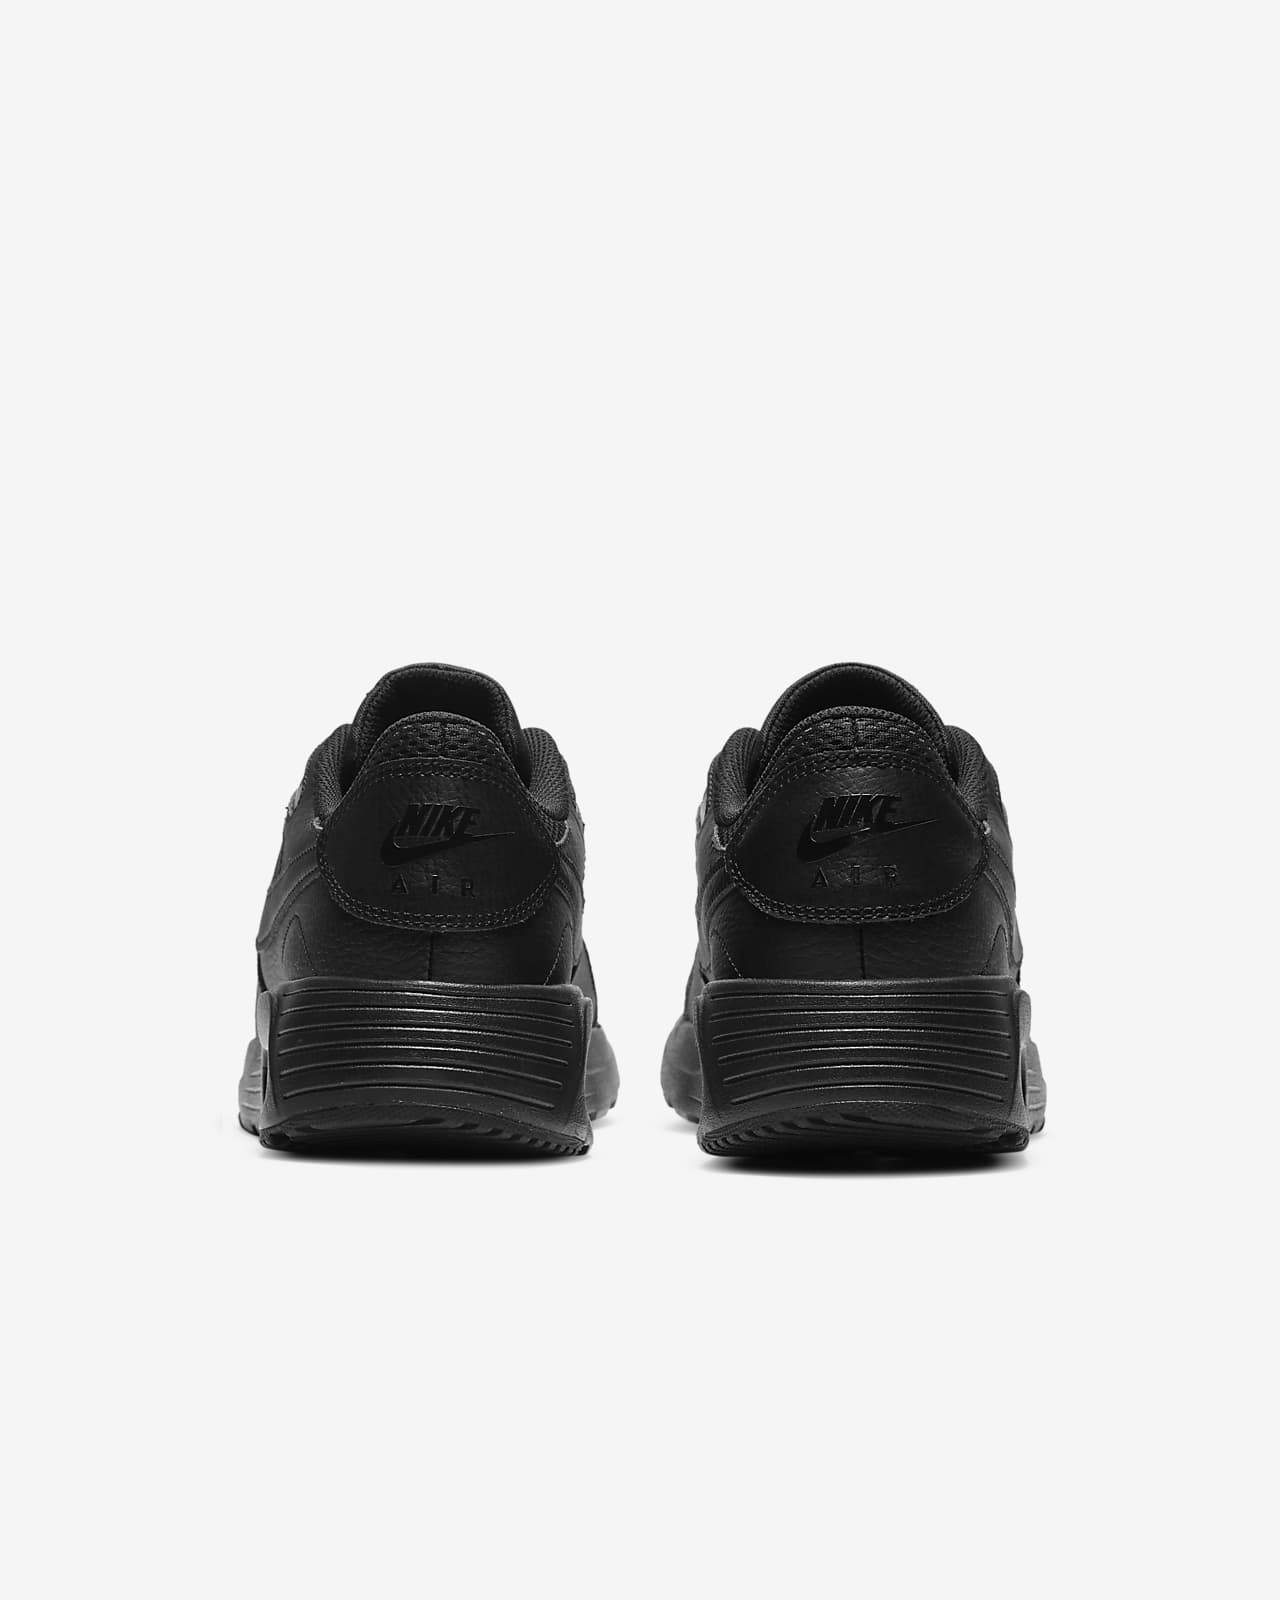 Nike Air Max SC Men's Shoe. Nike SA